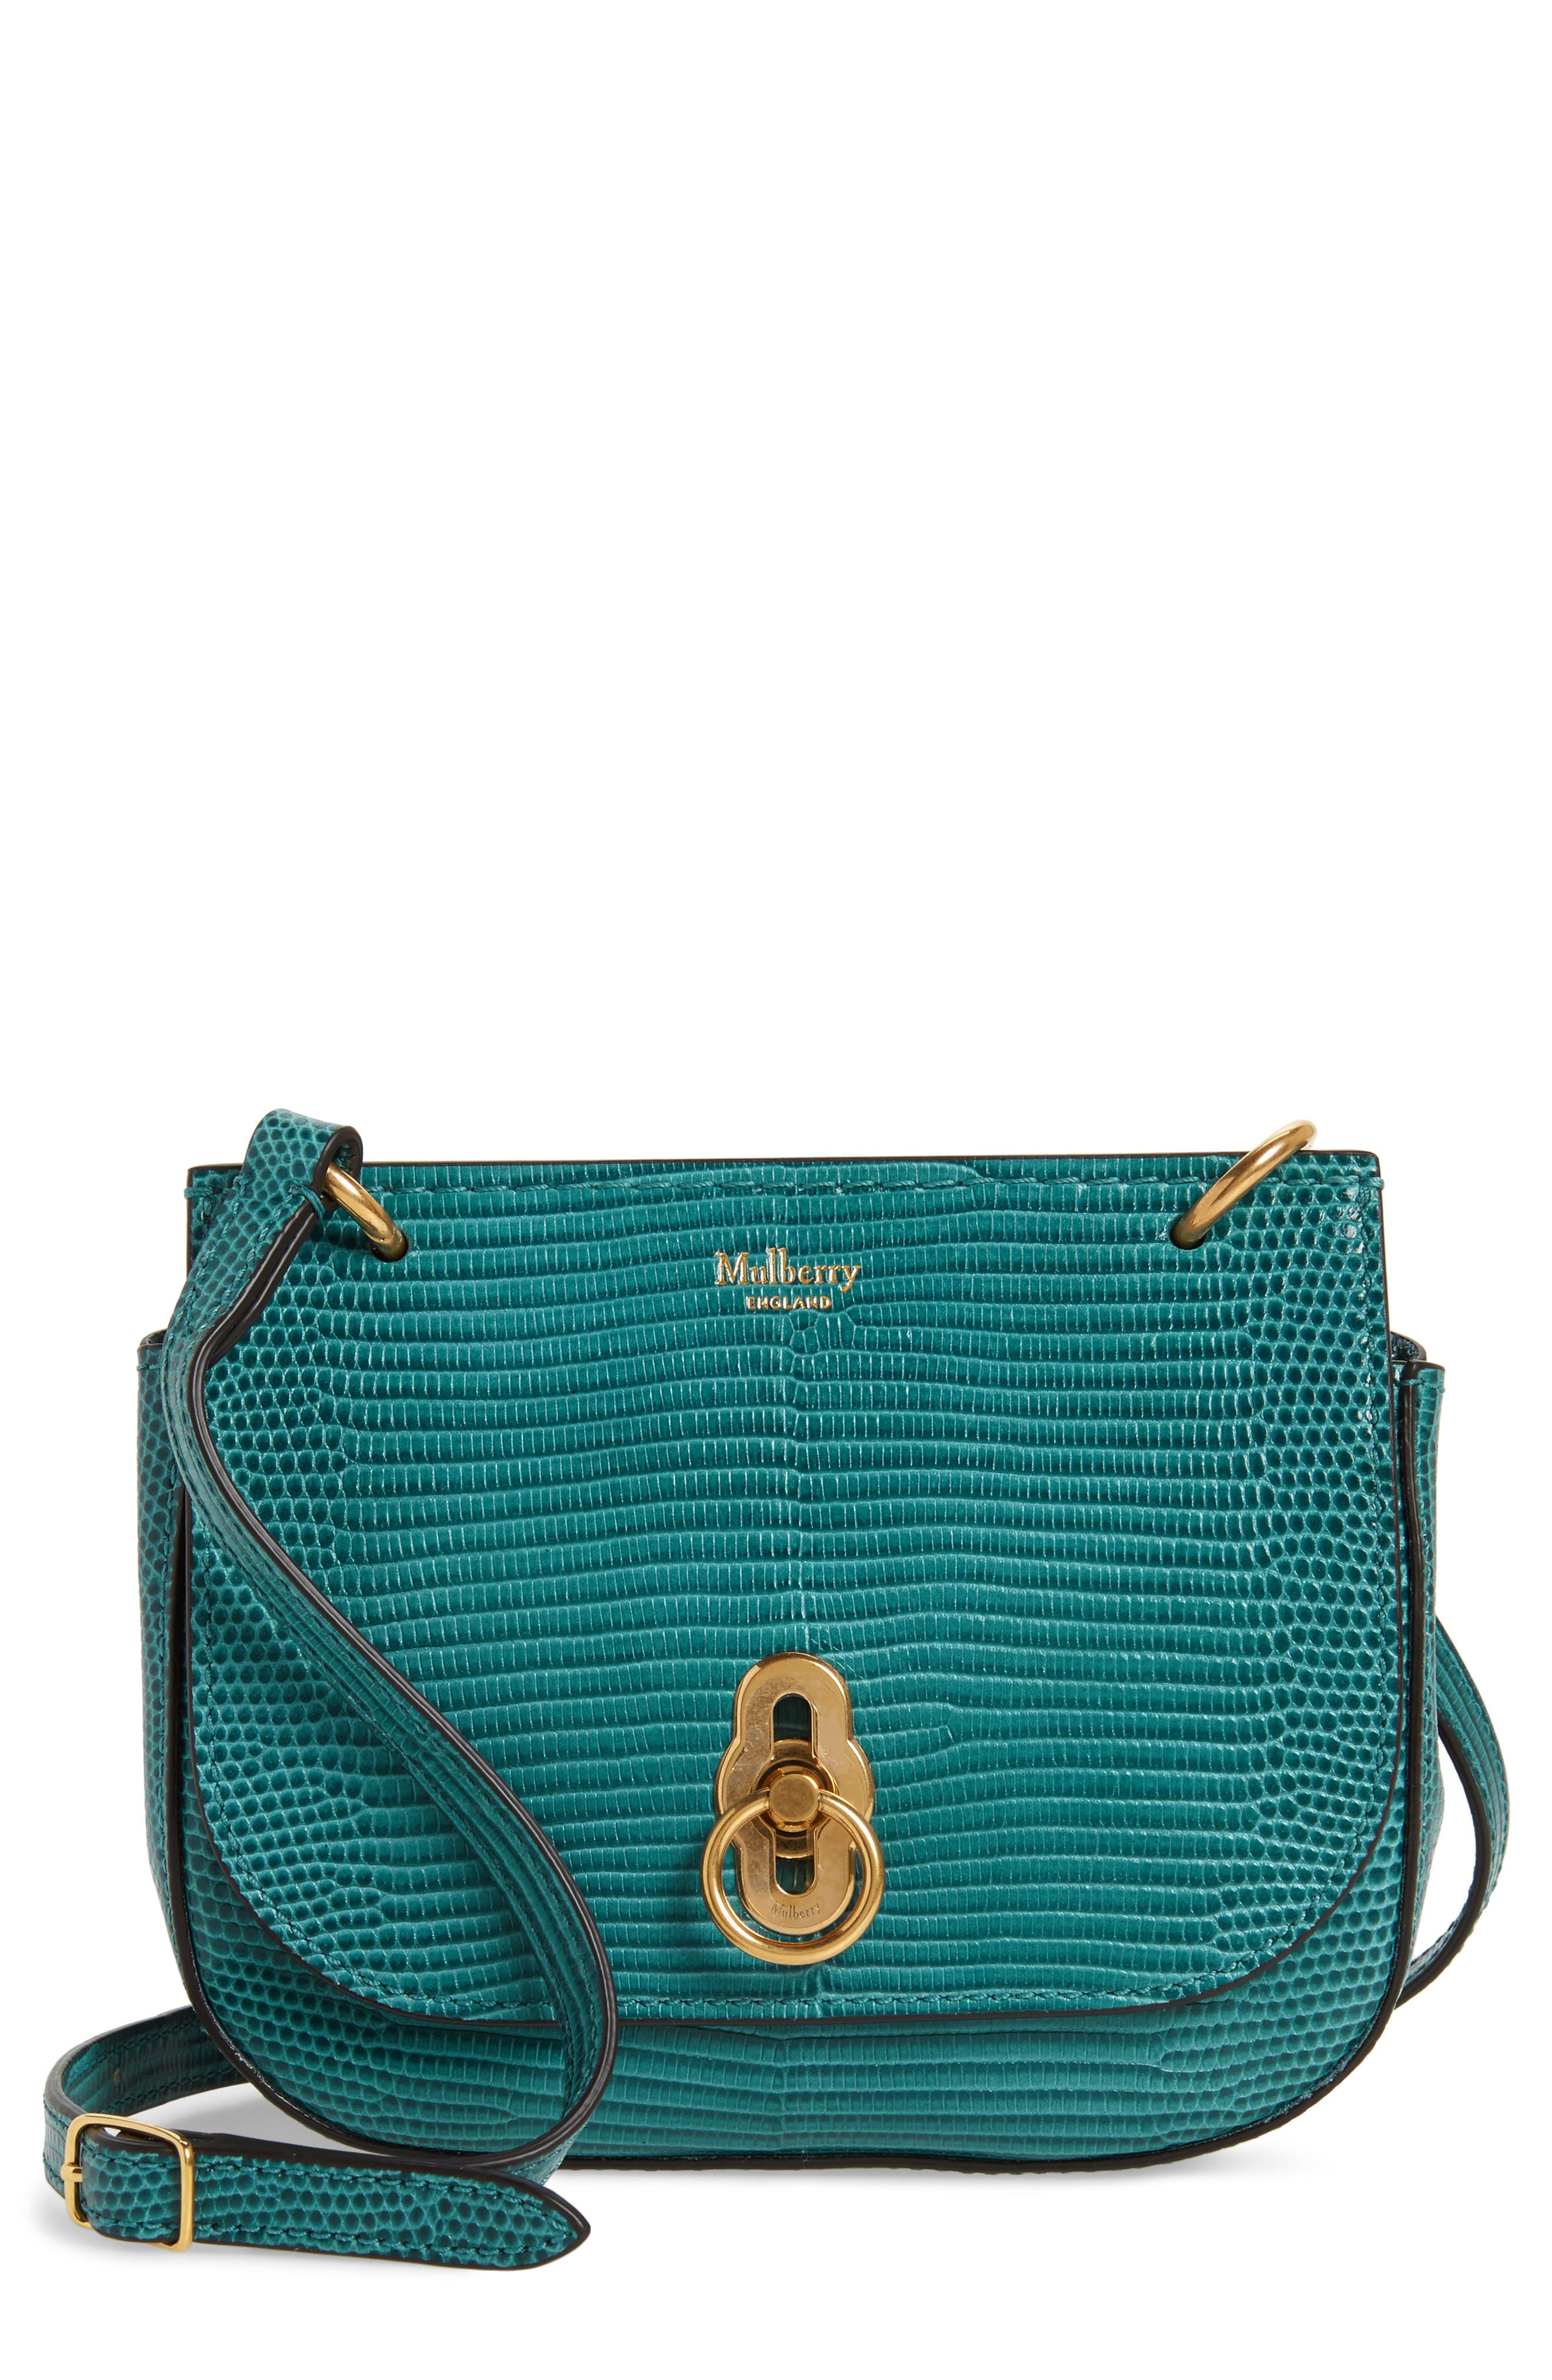 Main Image - Mulberry Mini Amberley Reptile Embossed Leather Crossbody Bag